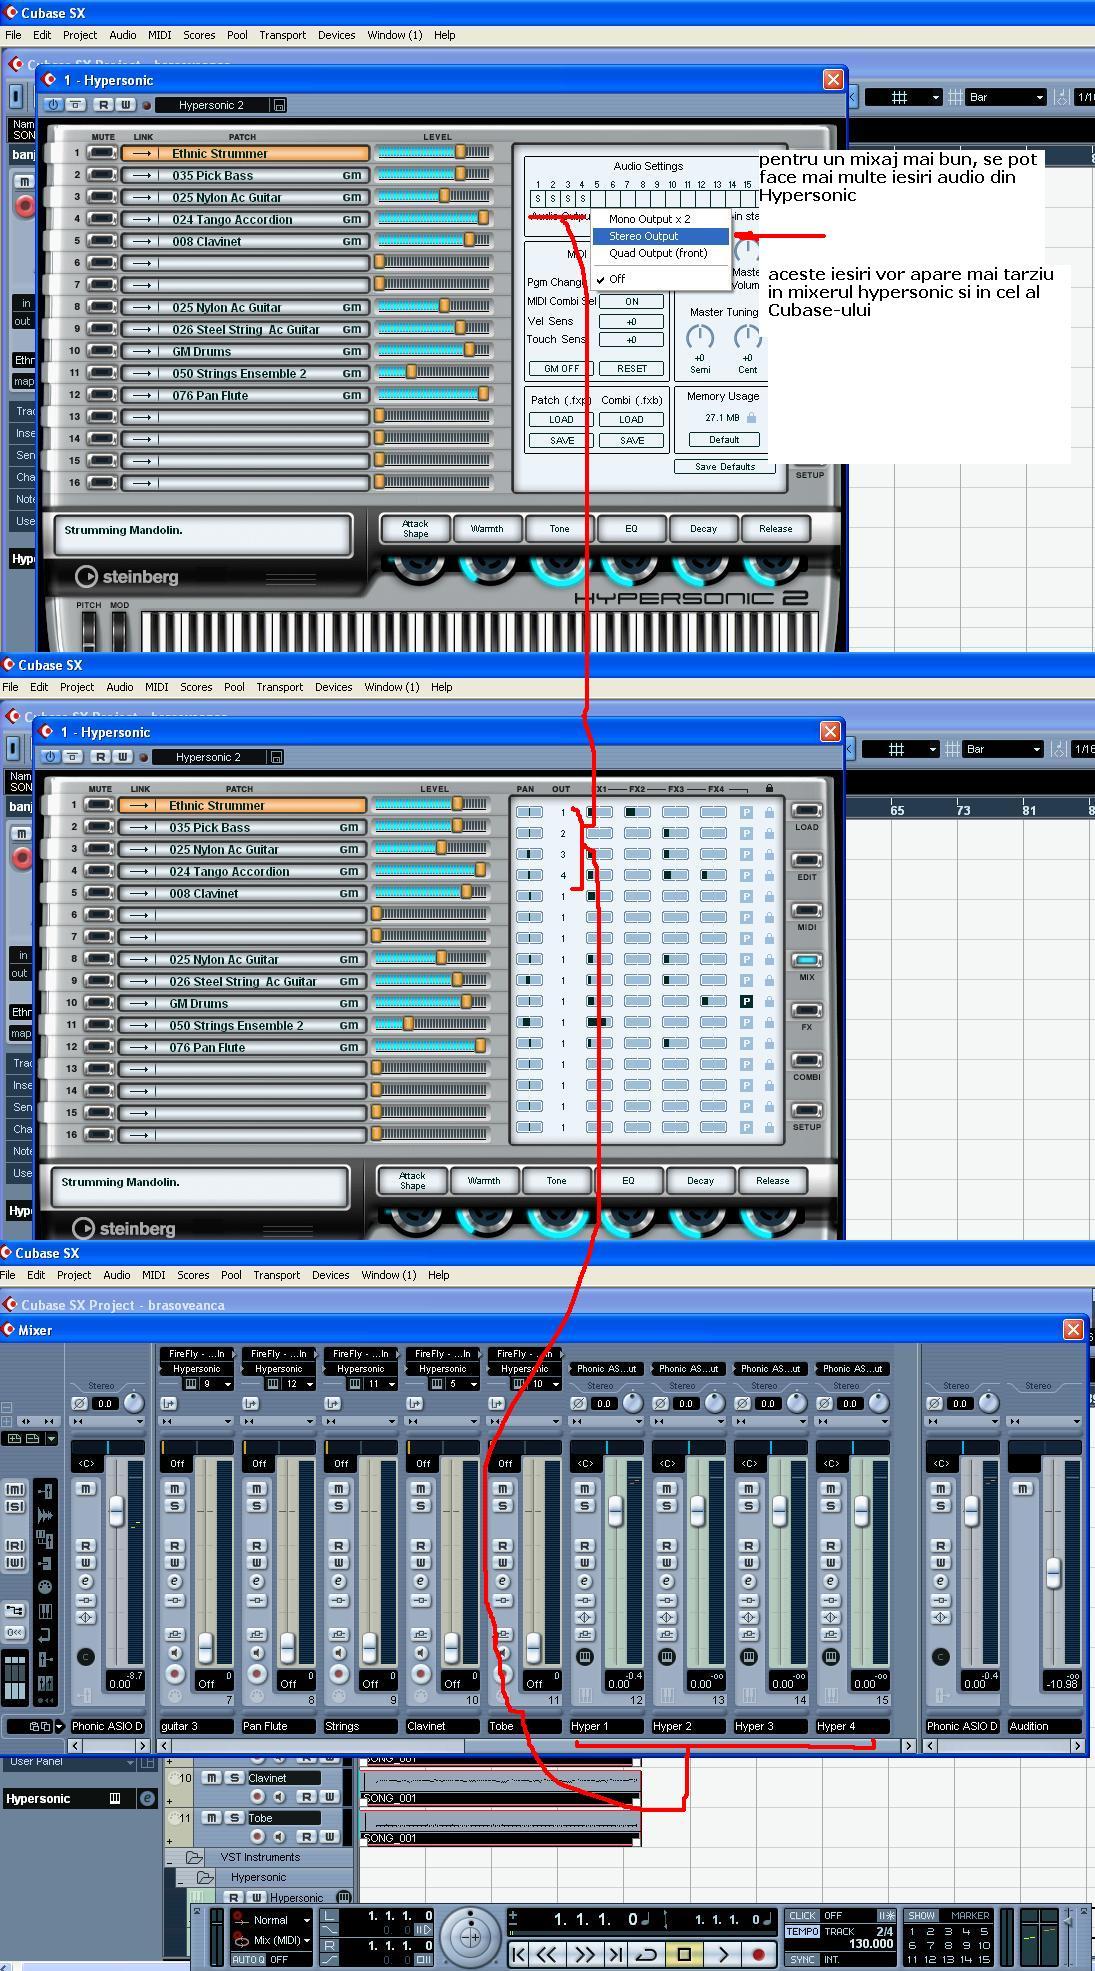 Mastering Cubase 9.5: VST Instruments & MIDI Inserts ...